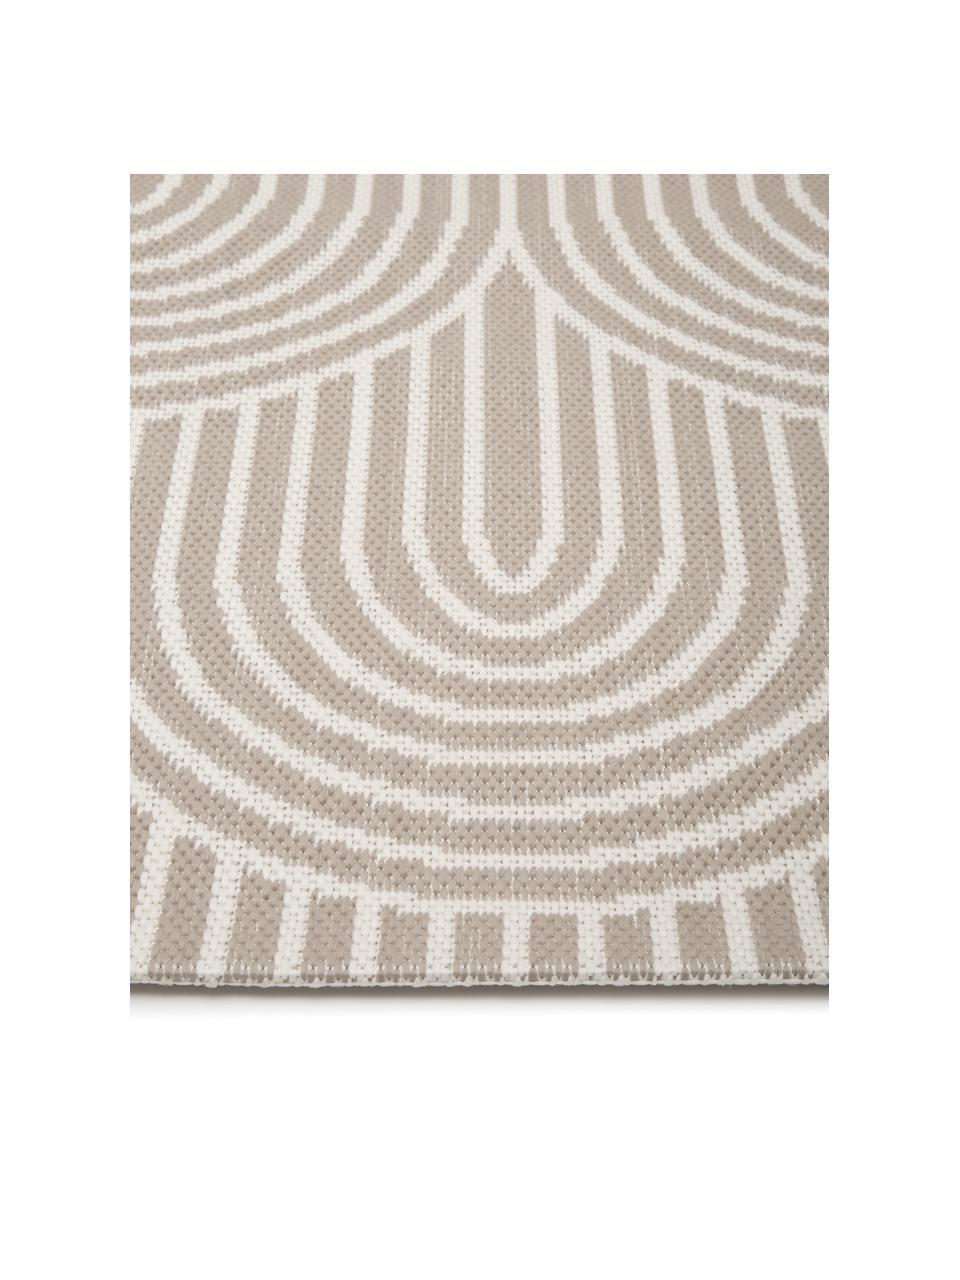 In- & outdoor vloerkleed Arches in beige/wit, 86% polypropyleen, 14% polyester, Beige, wit, B 200 x L 290 cm (maat L)